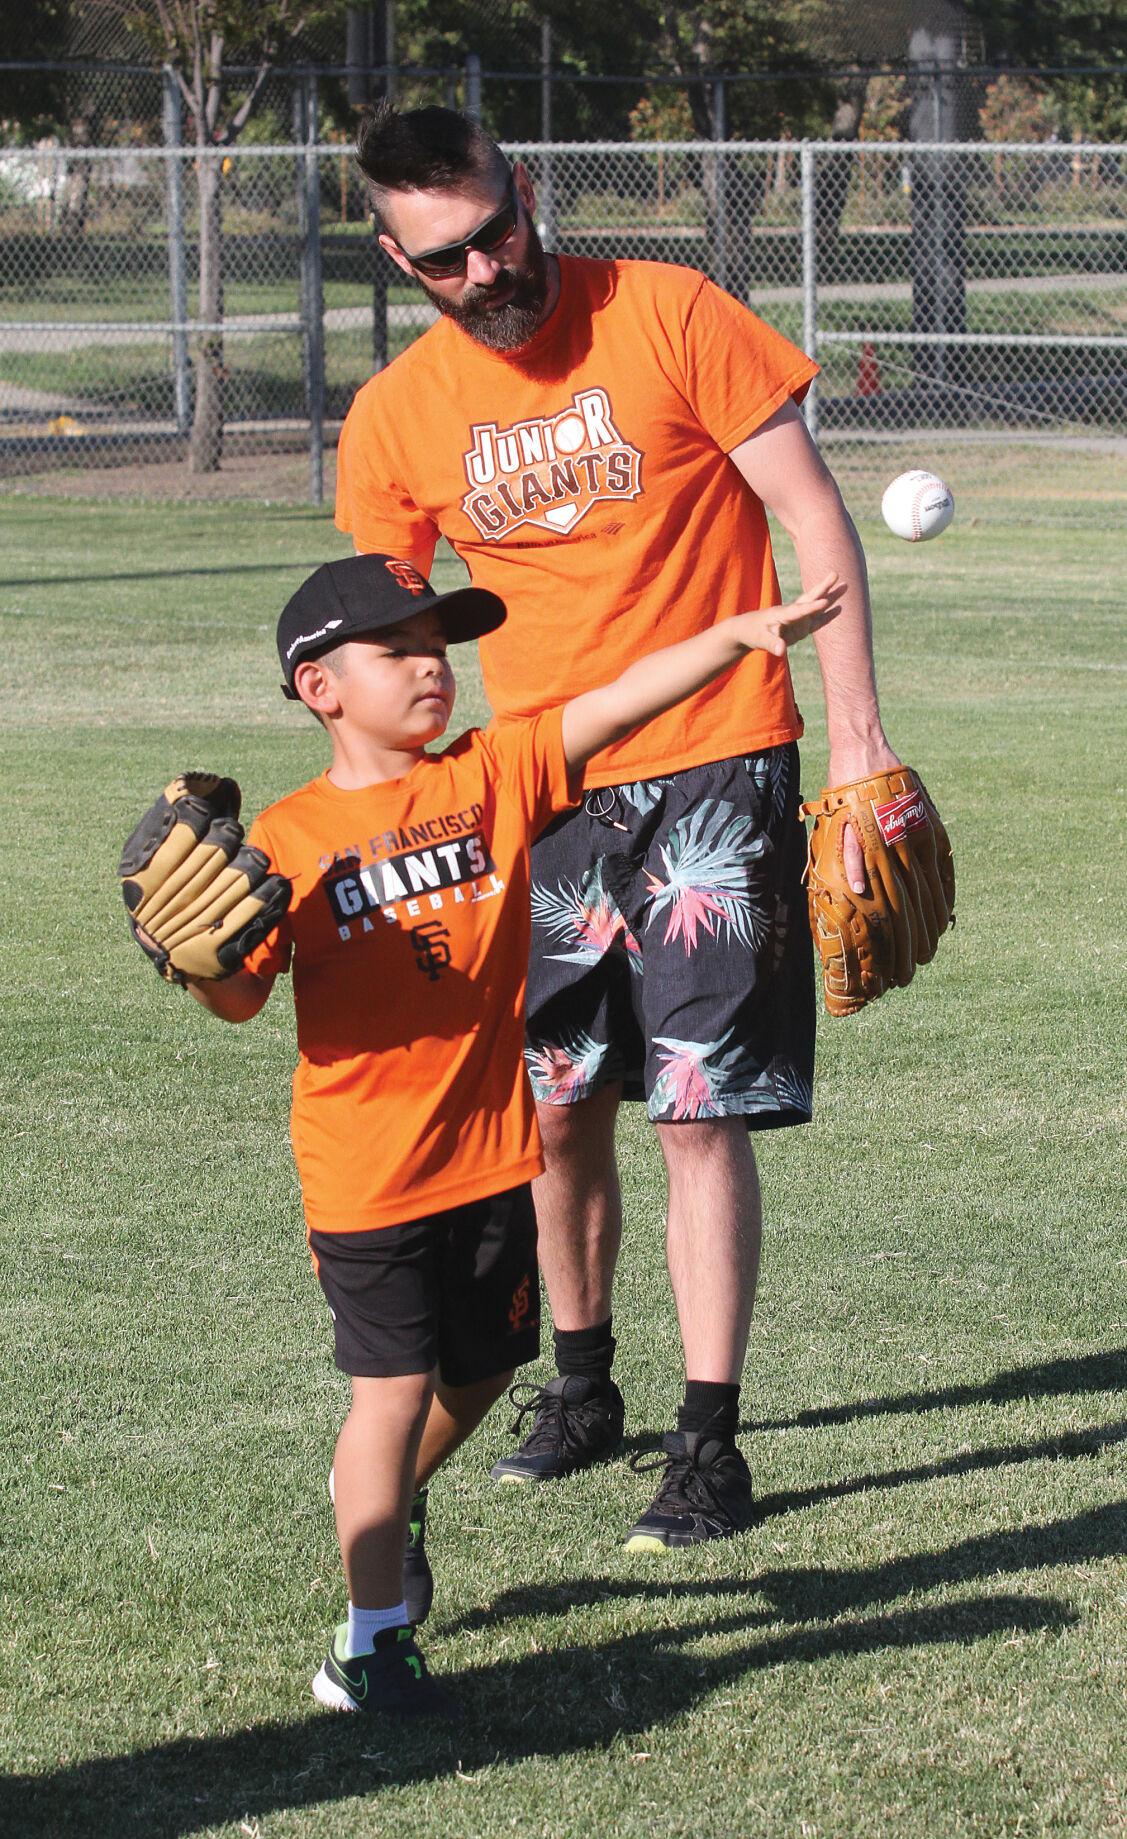 Junior Giants program